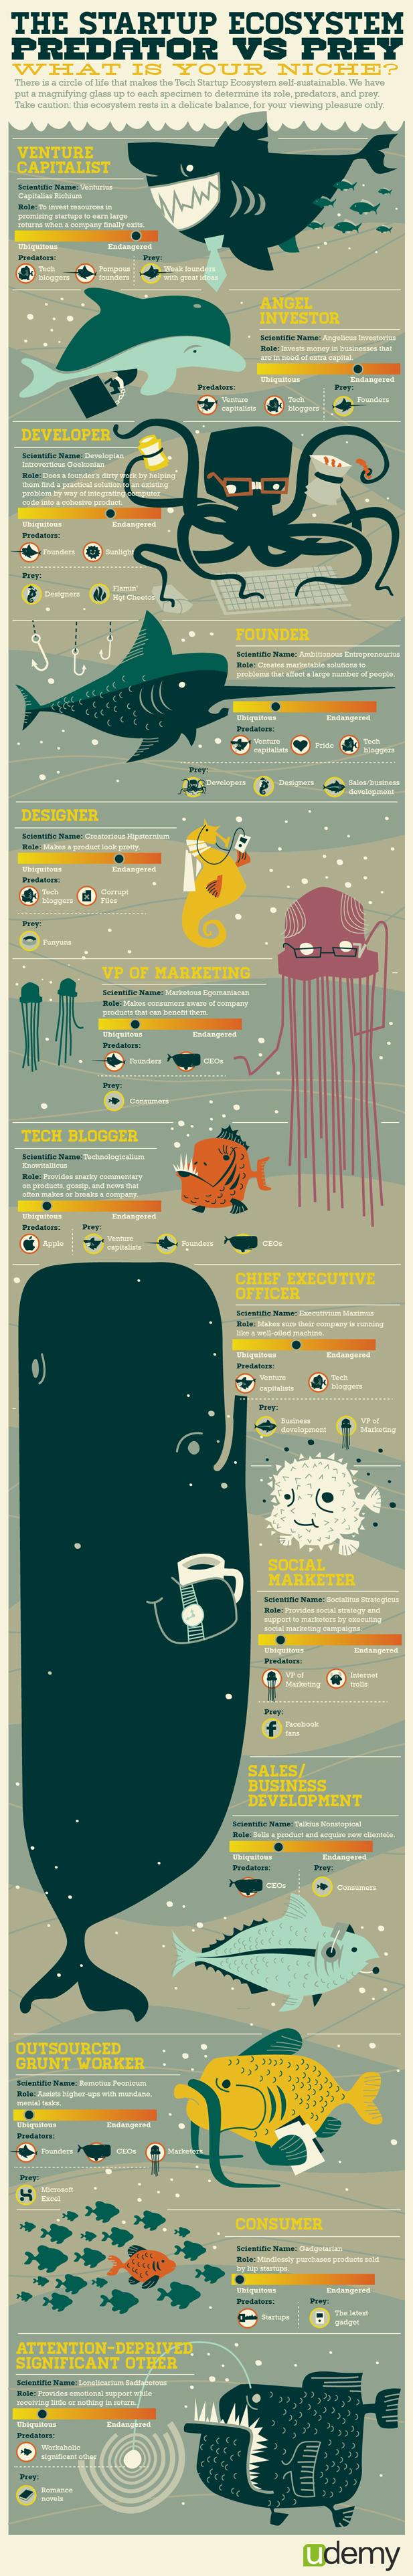 Startup Ecosystem Infographic